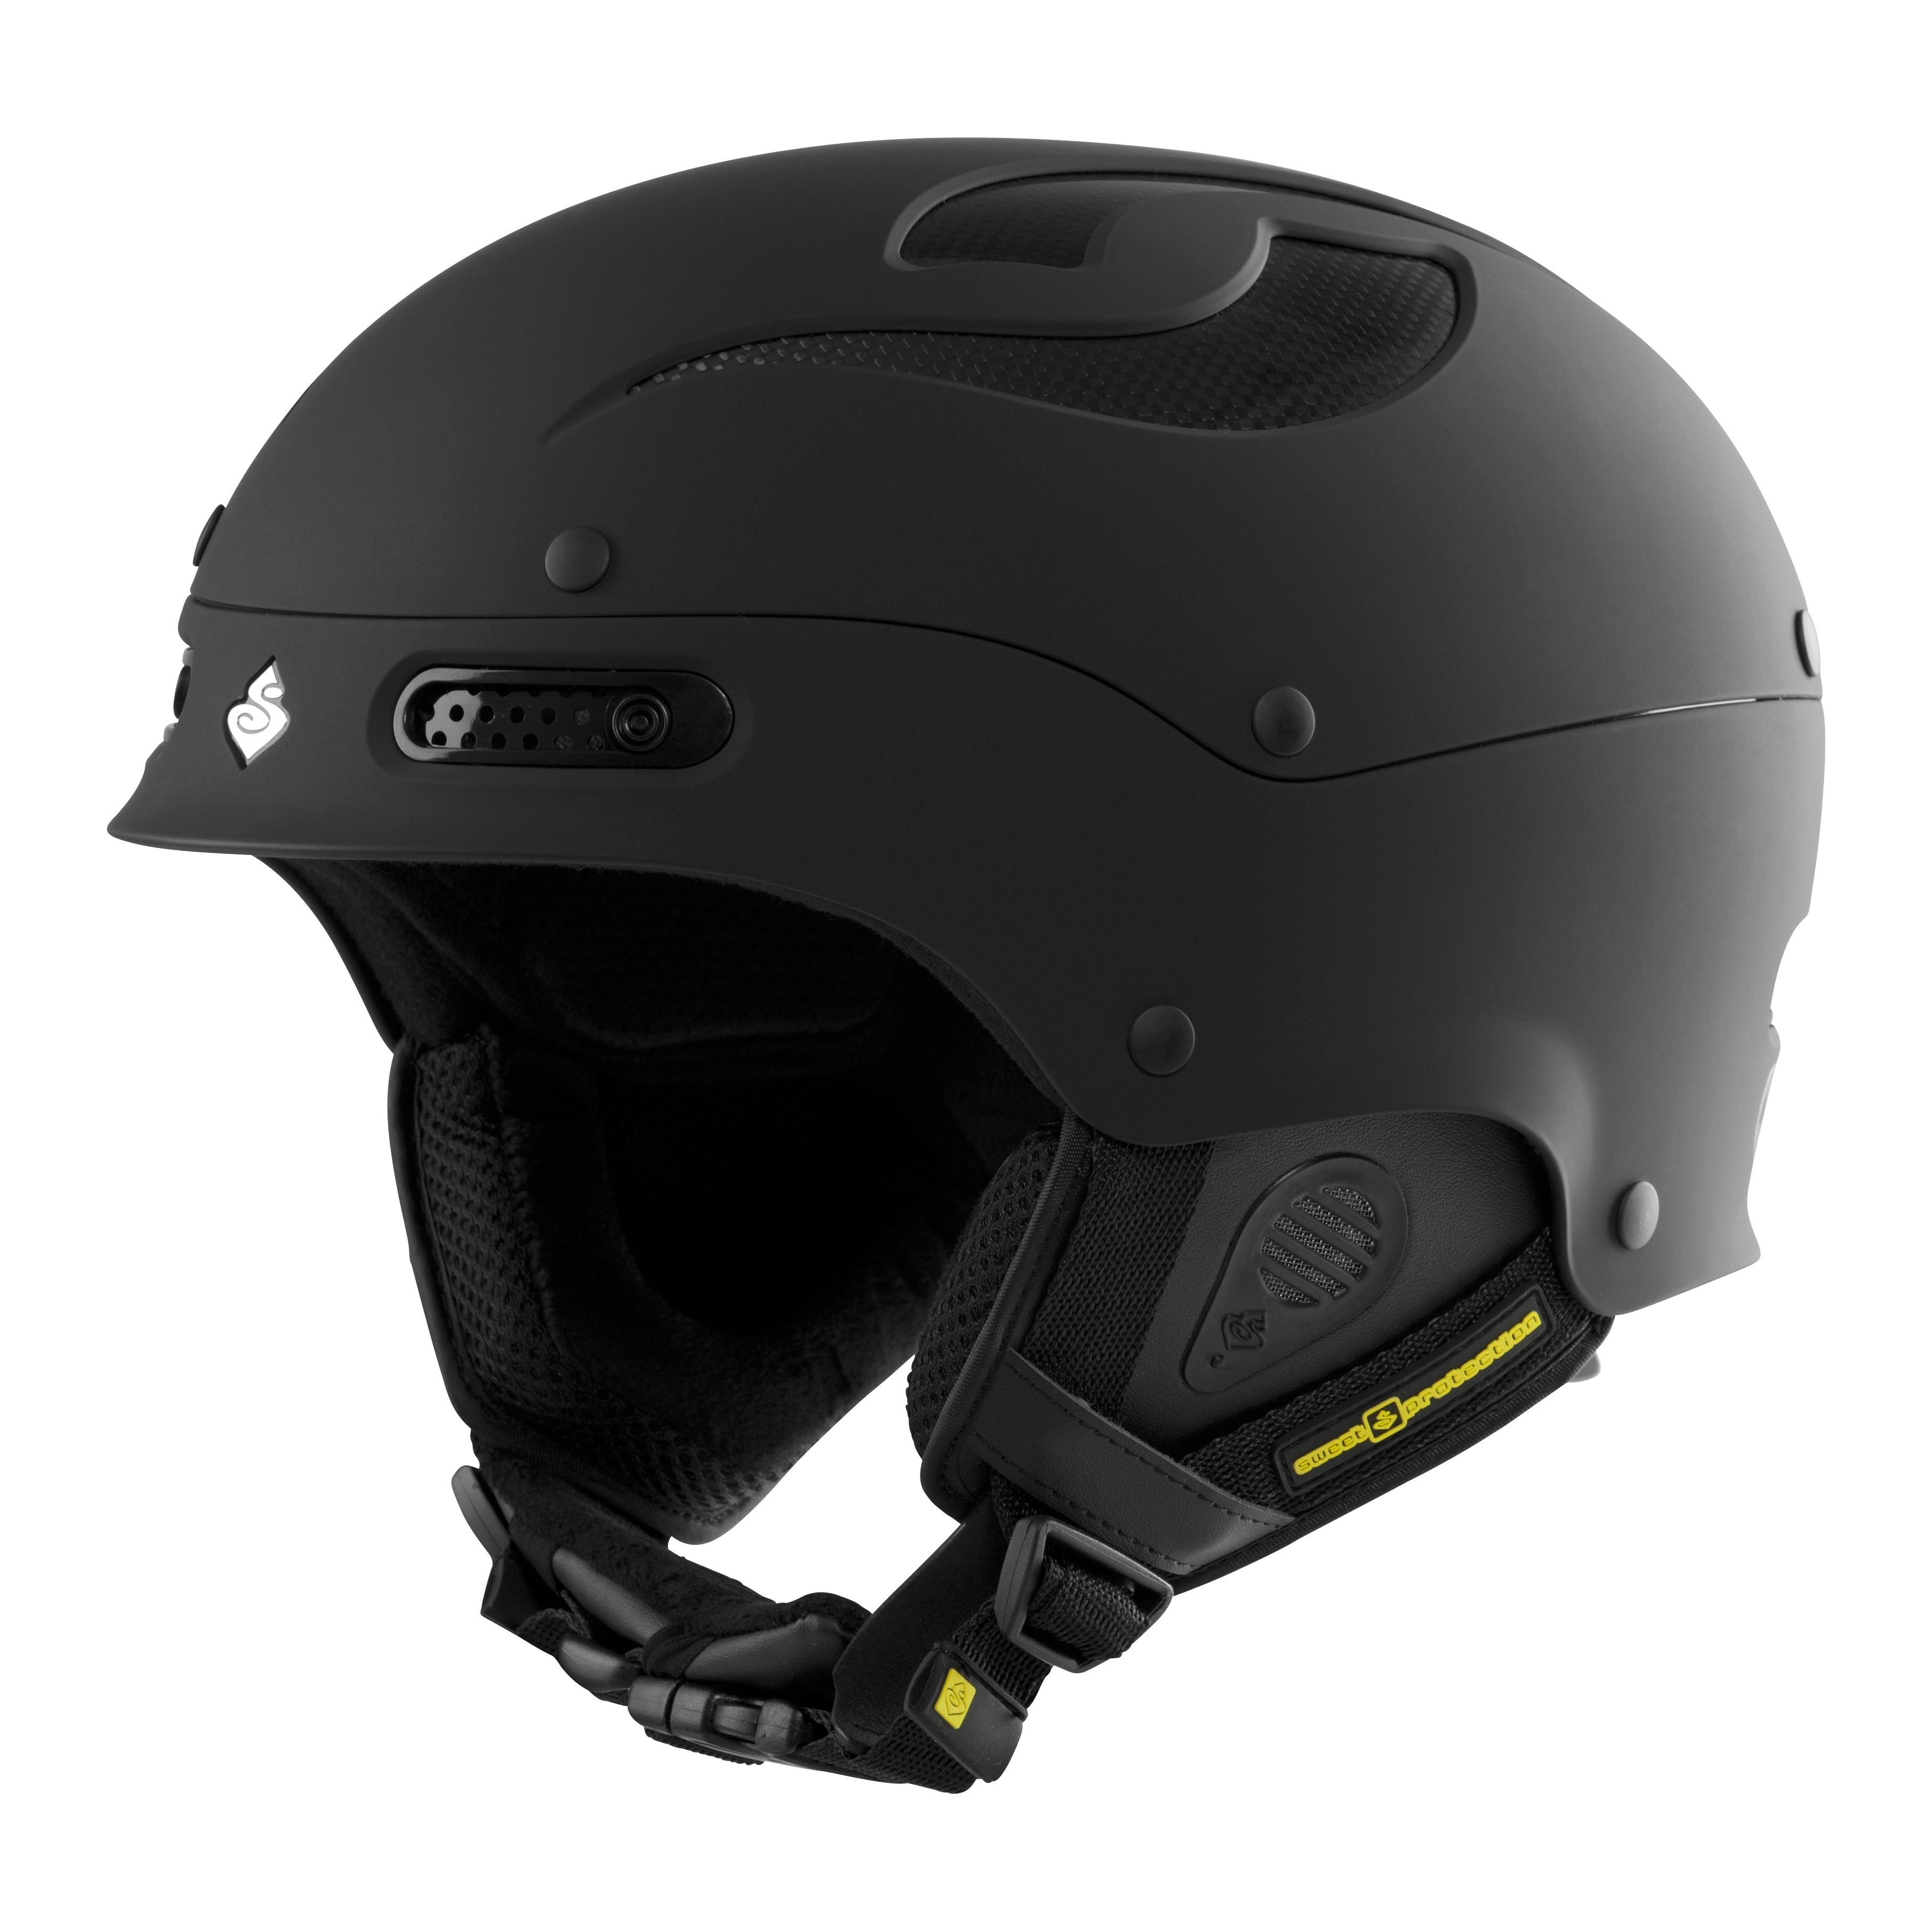 Trooper Mips Helmet | Hjelme